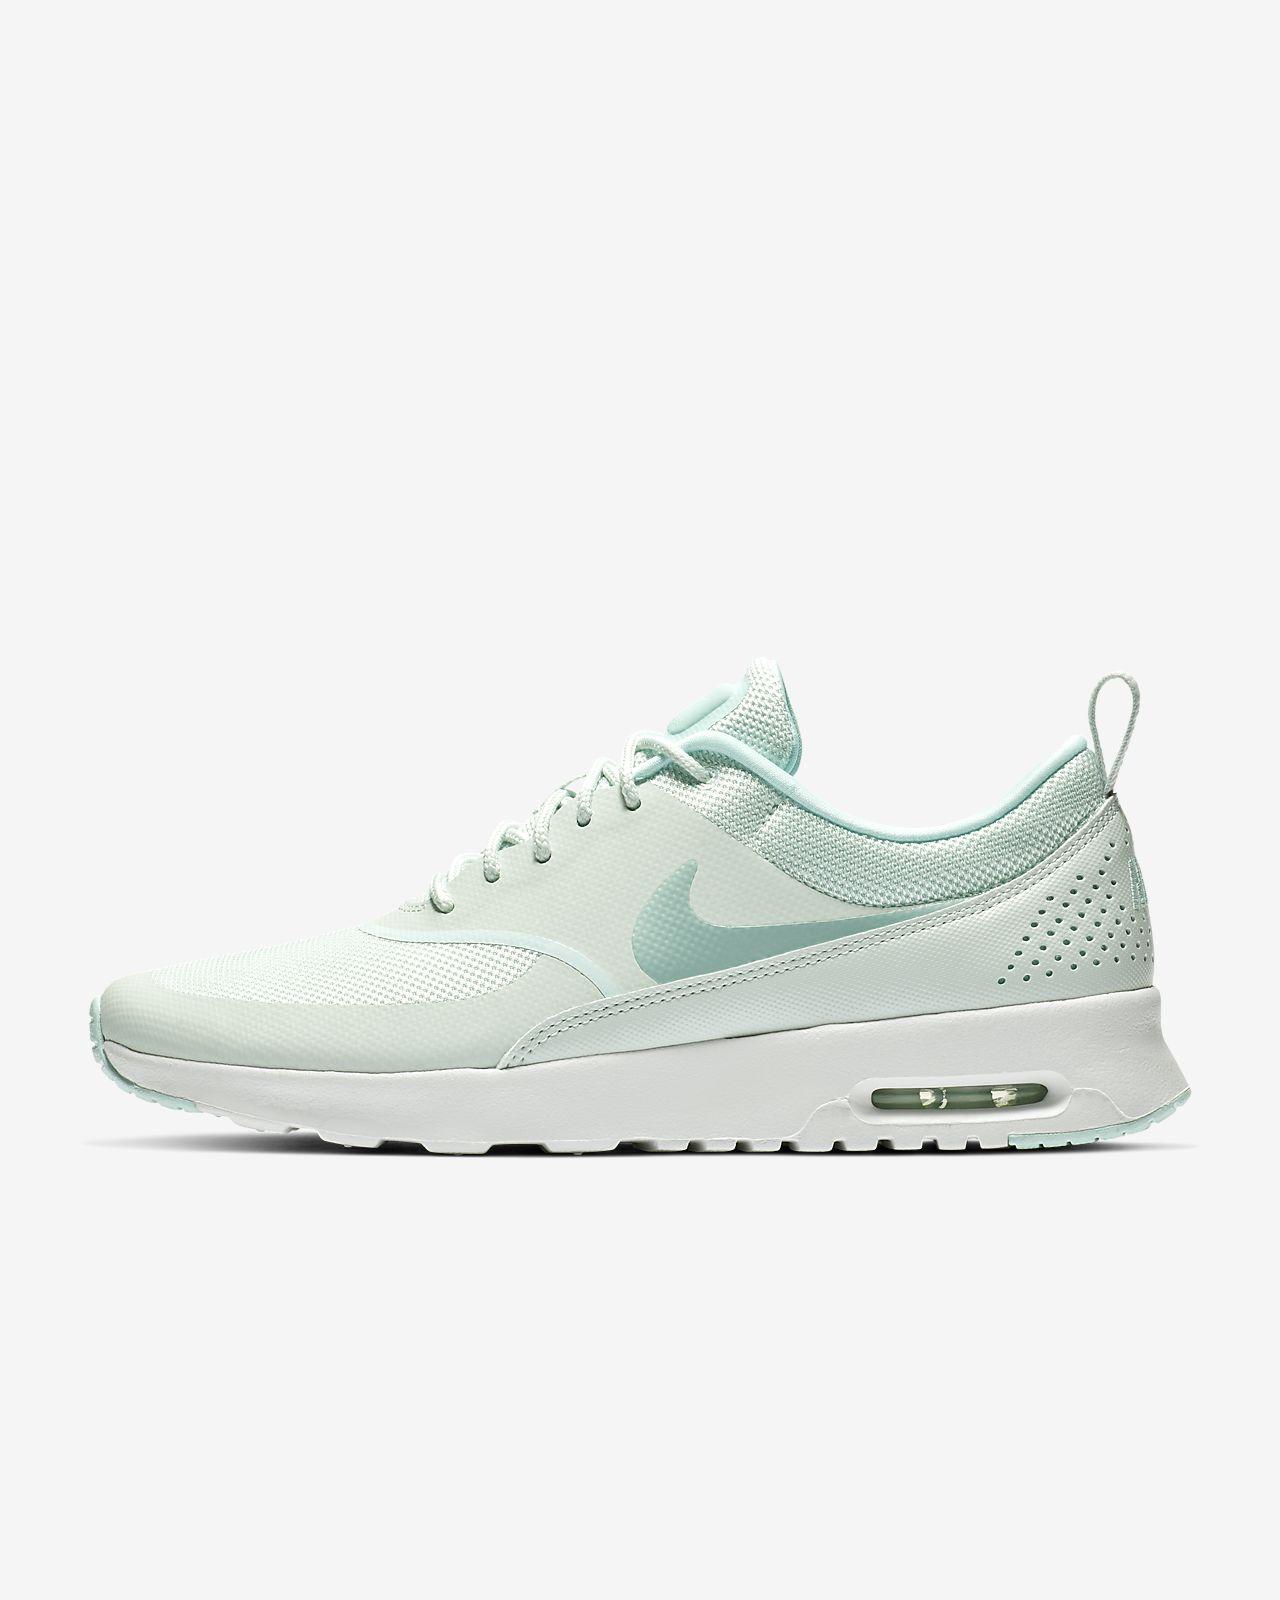 f032815ad3a1d Nike Air Max Thea Zapatillas - Mujer. Nike.com ES